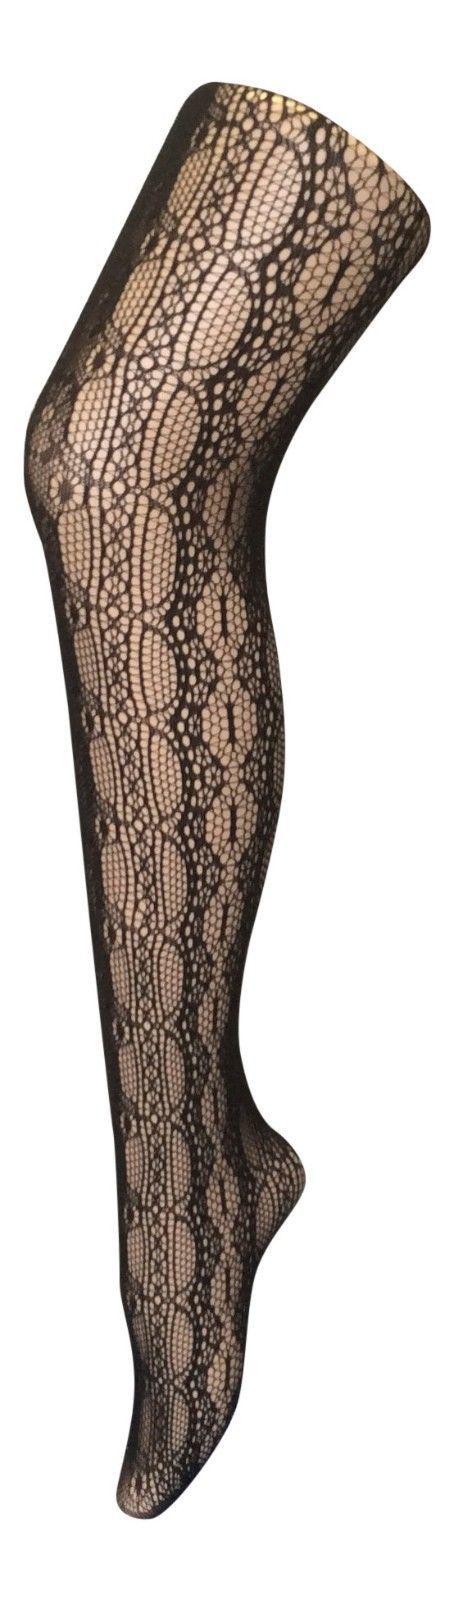 Women's Fancy patterned semi opaque Tights, One size 8-14 uk, 36-42 eu, designer